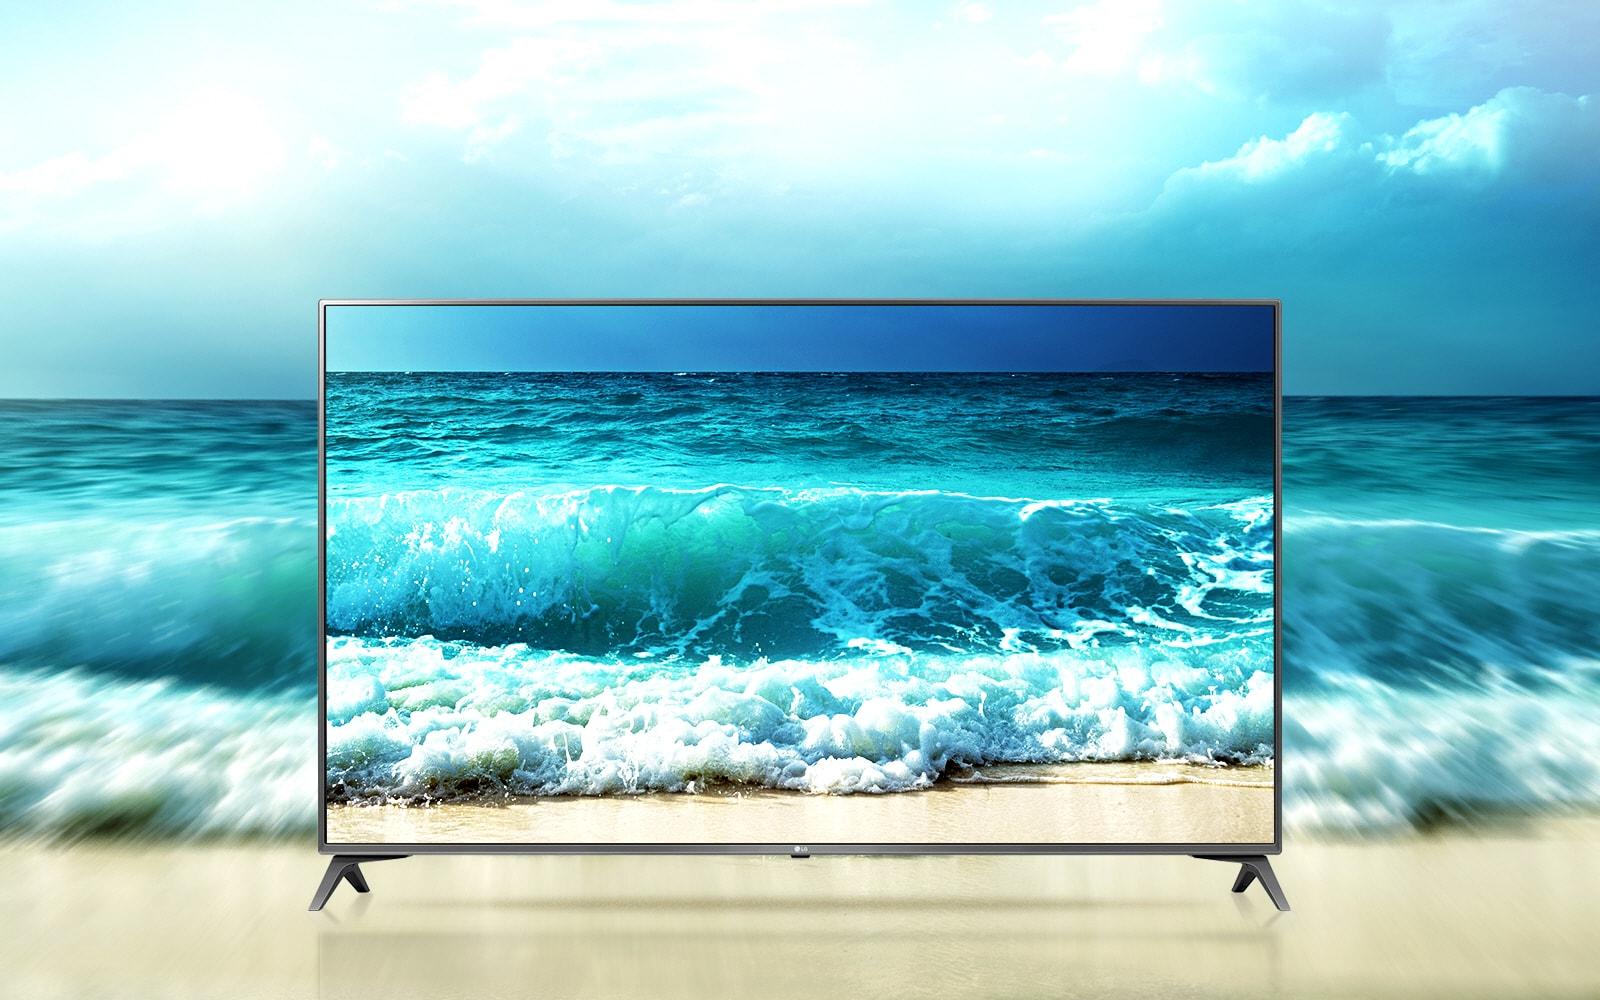 Lg Ultra Hd Tv Indonesia 43lh500t Led 43 Inch Khusus Jabodetabek 06 65 60 55 49 43uj65 B Surround